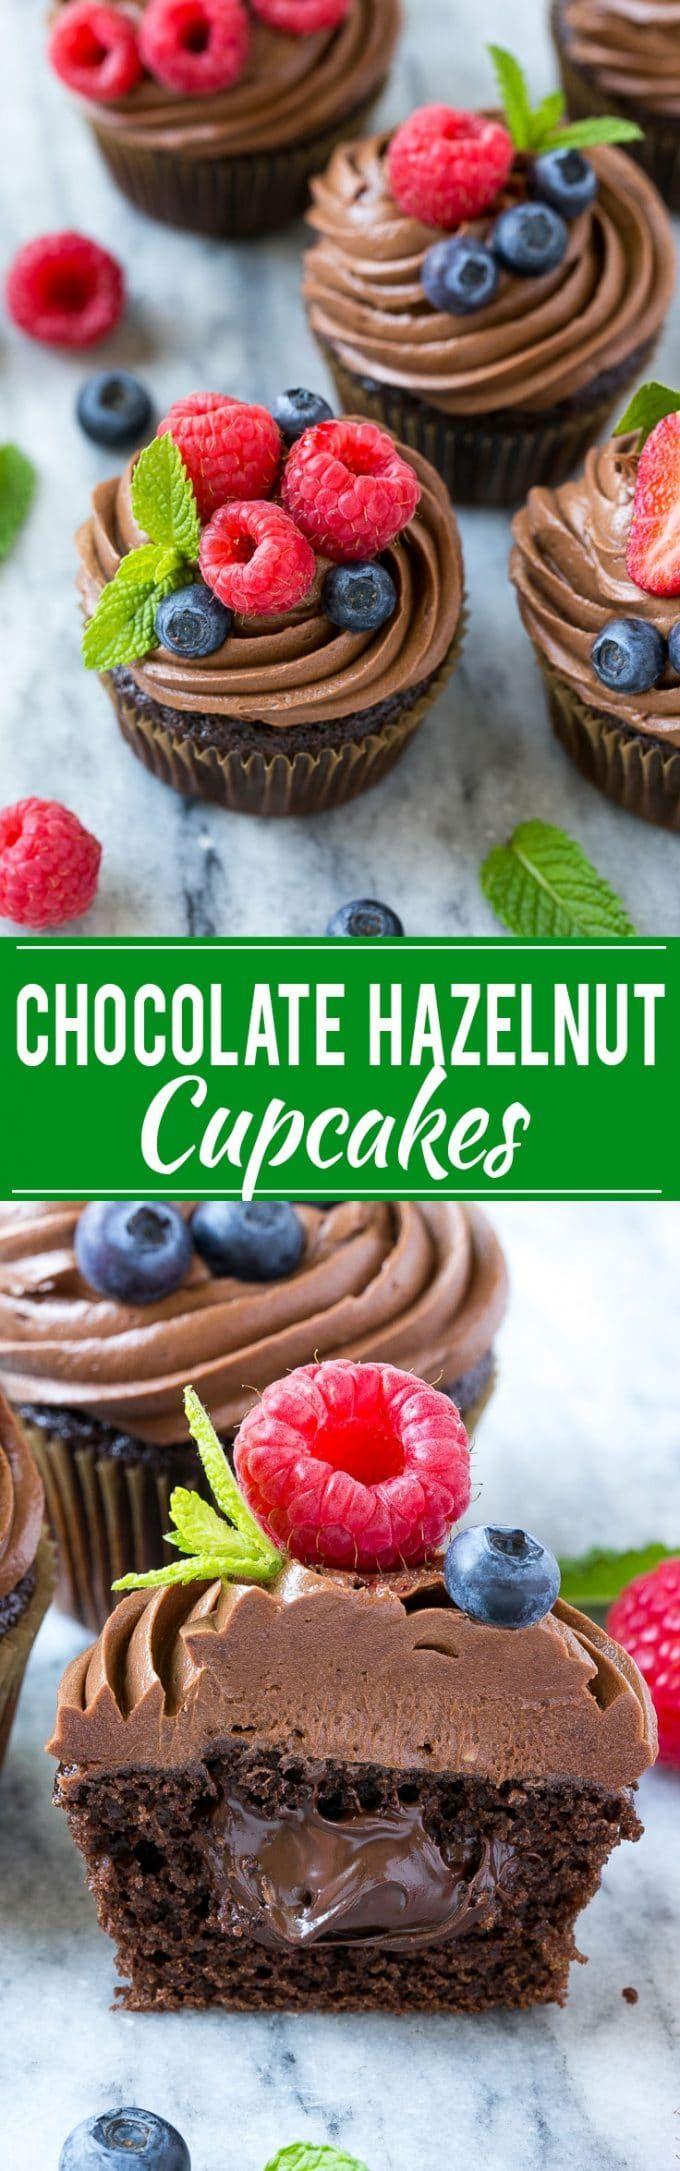 Chocolate Hazelnut Cupcake Recipe | Best Chocolate Cupcake Recipe | Chocolate Nutella Cupcakes | Nutella Cupcakes | Nutella Cake